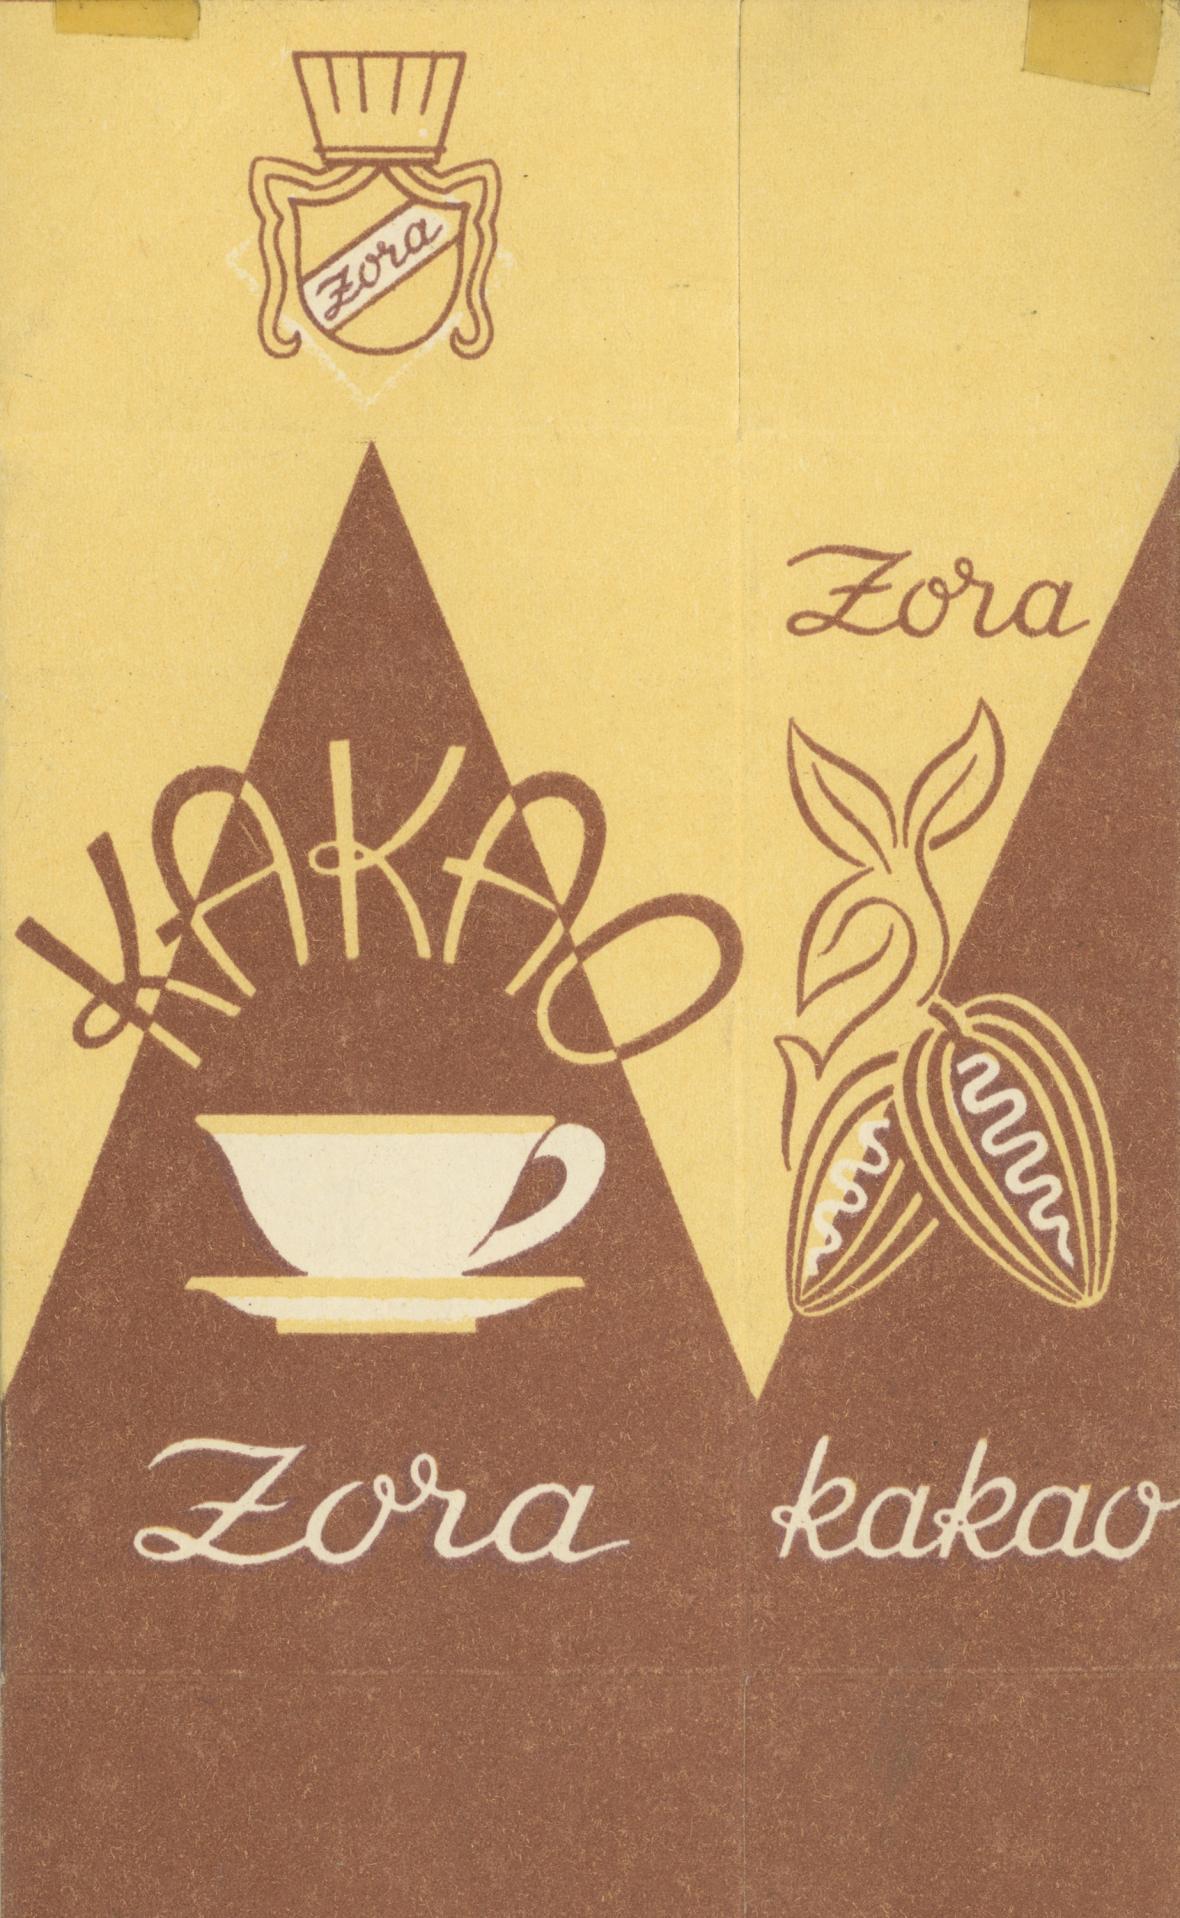 Kakao Zora